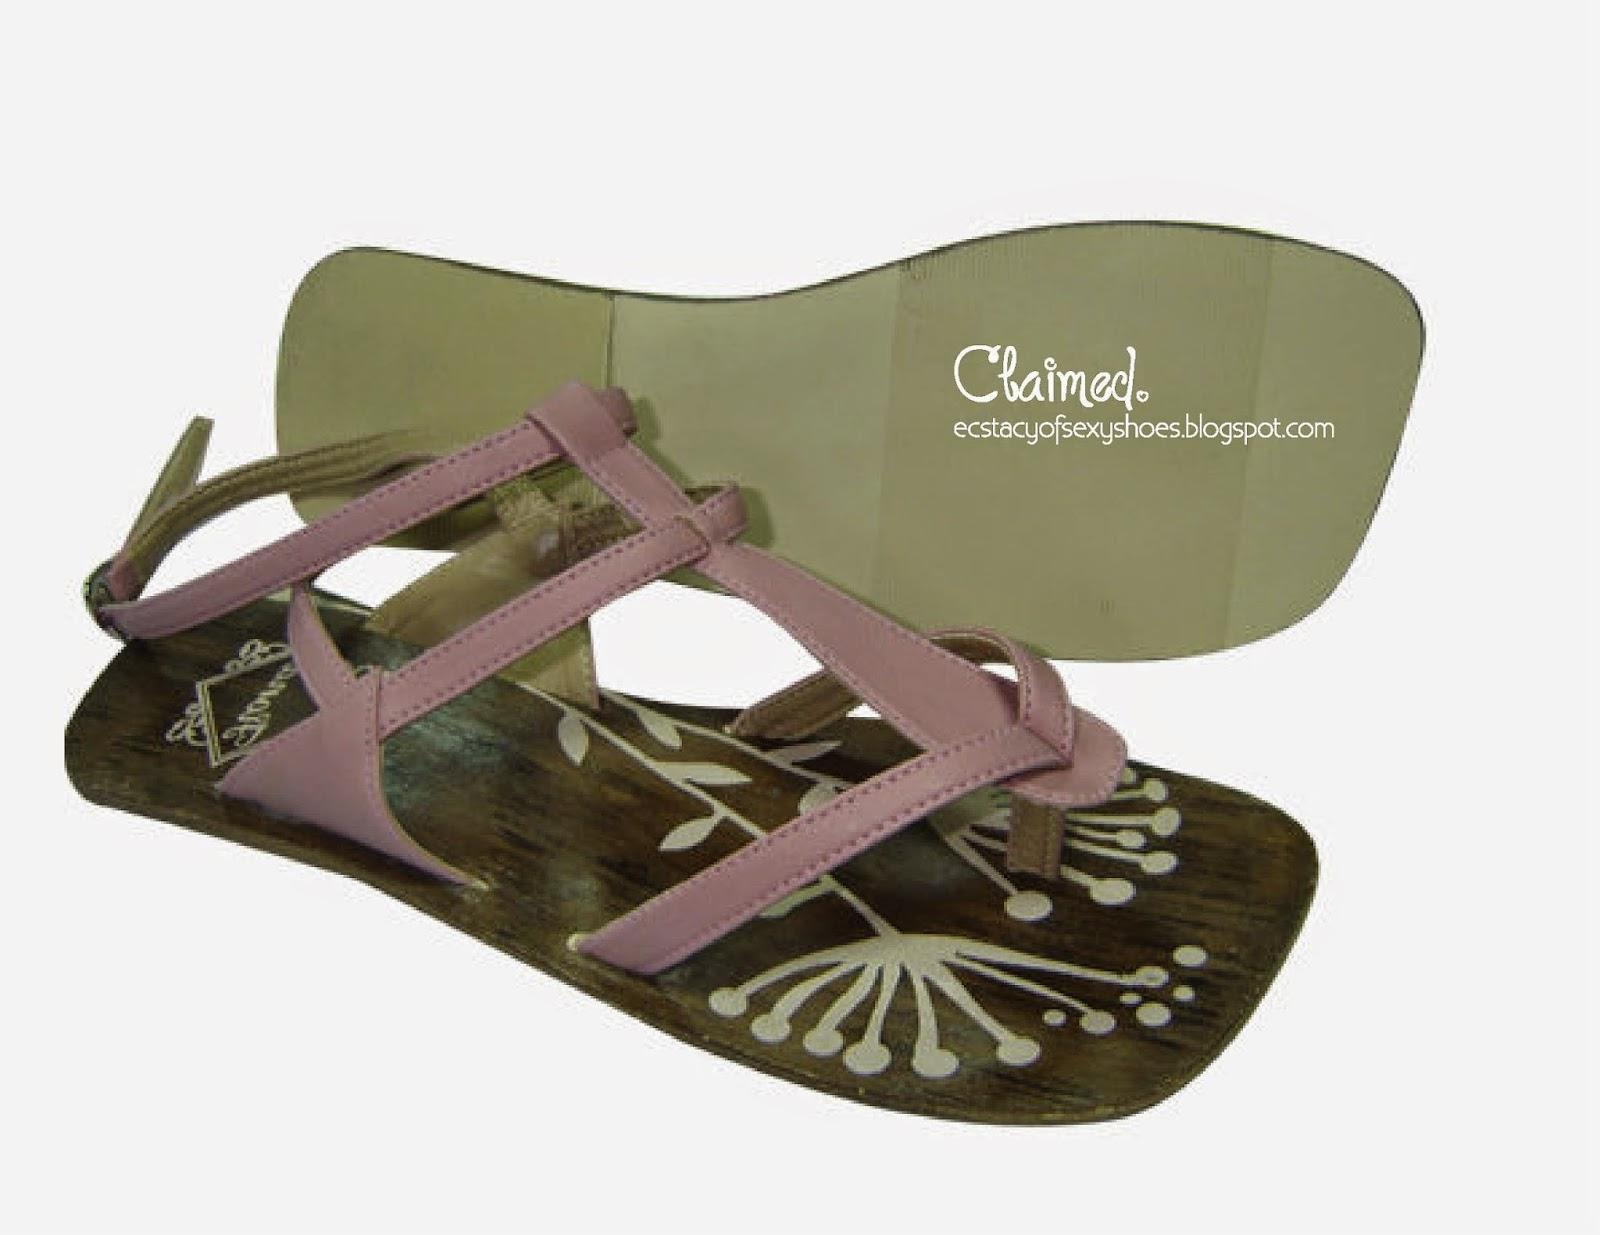 geta sandals - photo #3